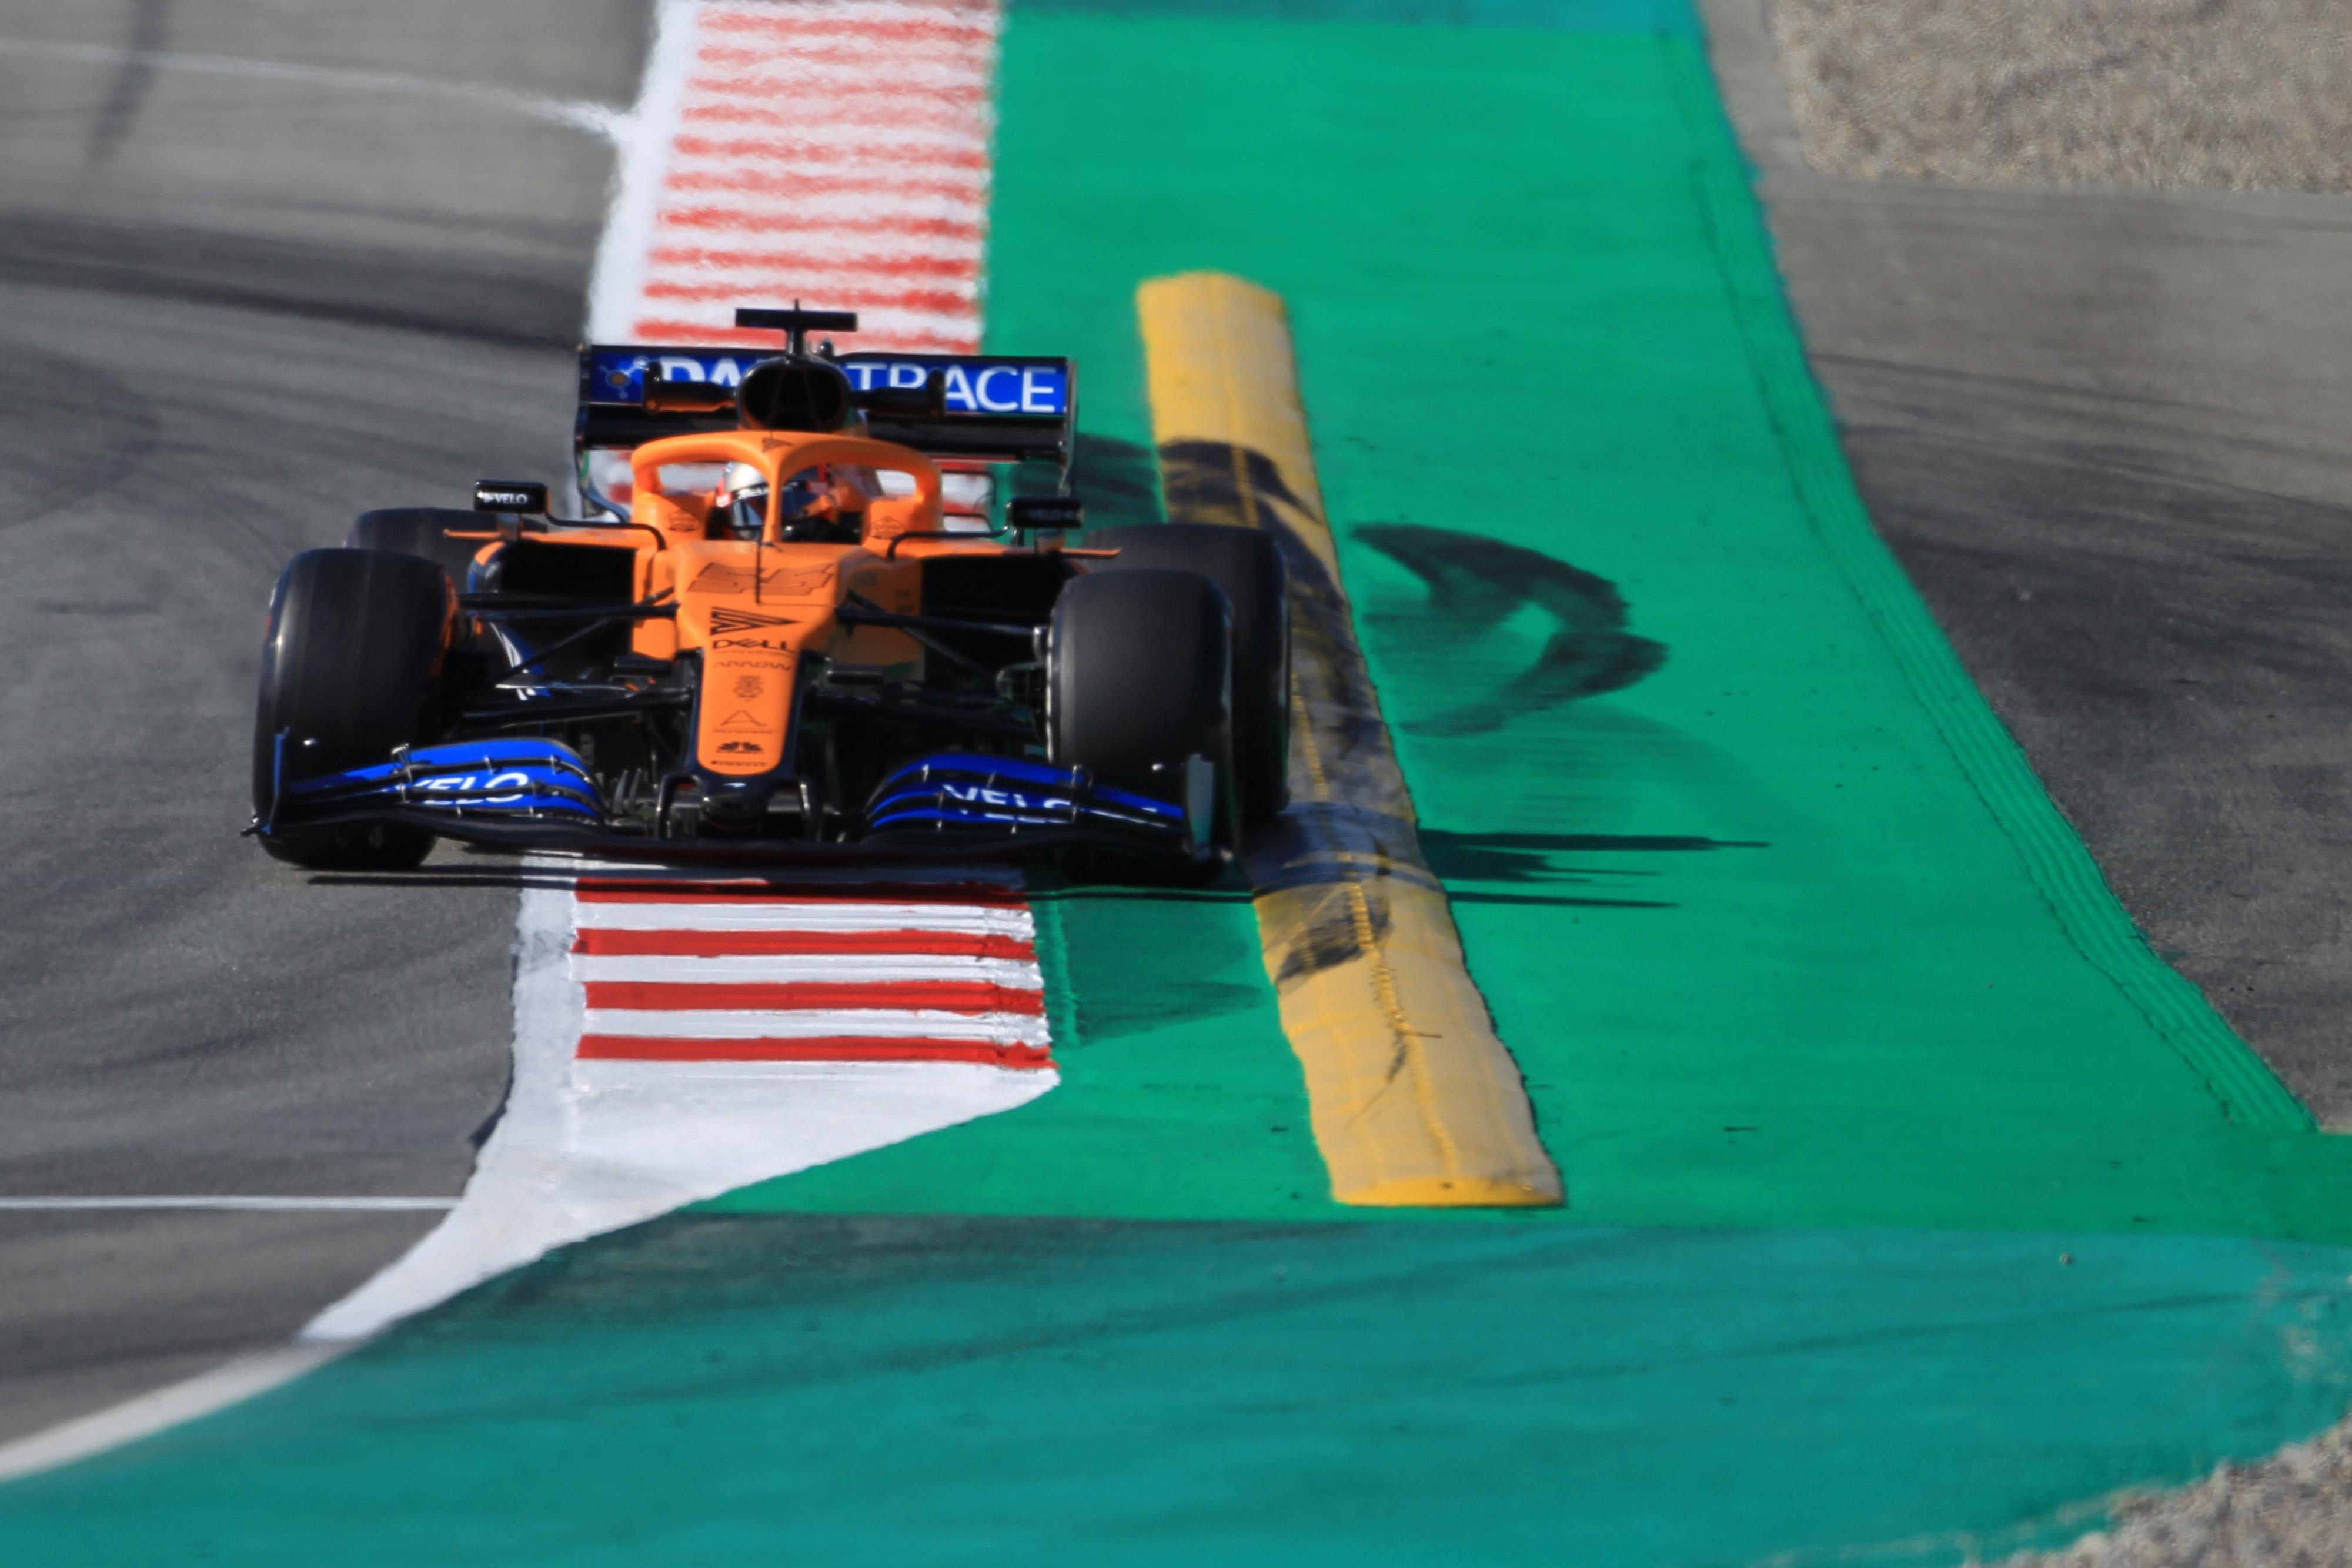 F1 Formula 1 Carlos Sainz McLaren Grand Prix car